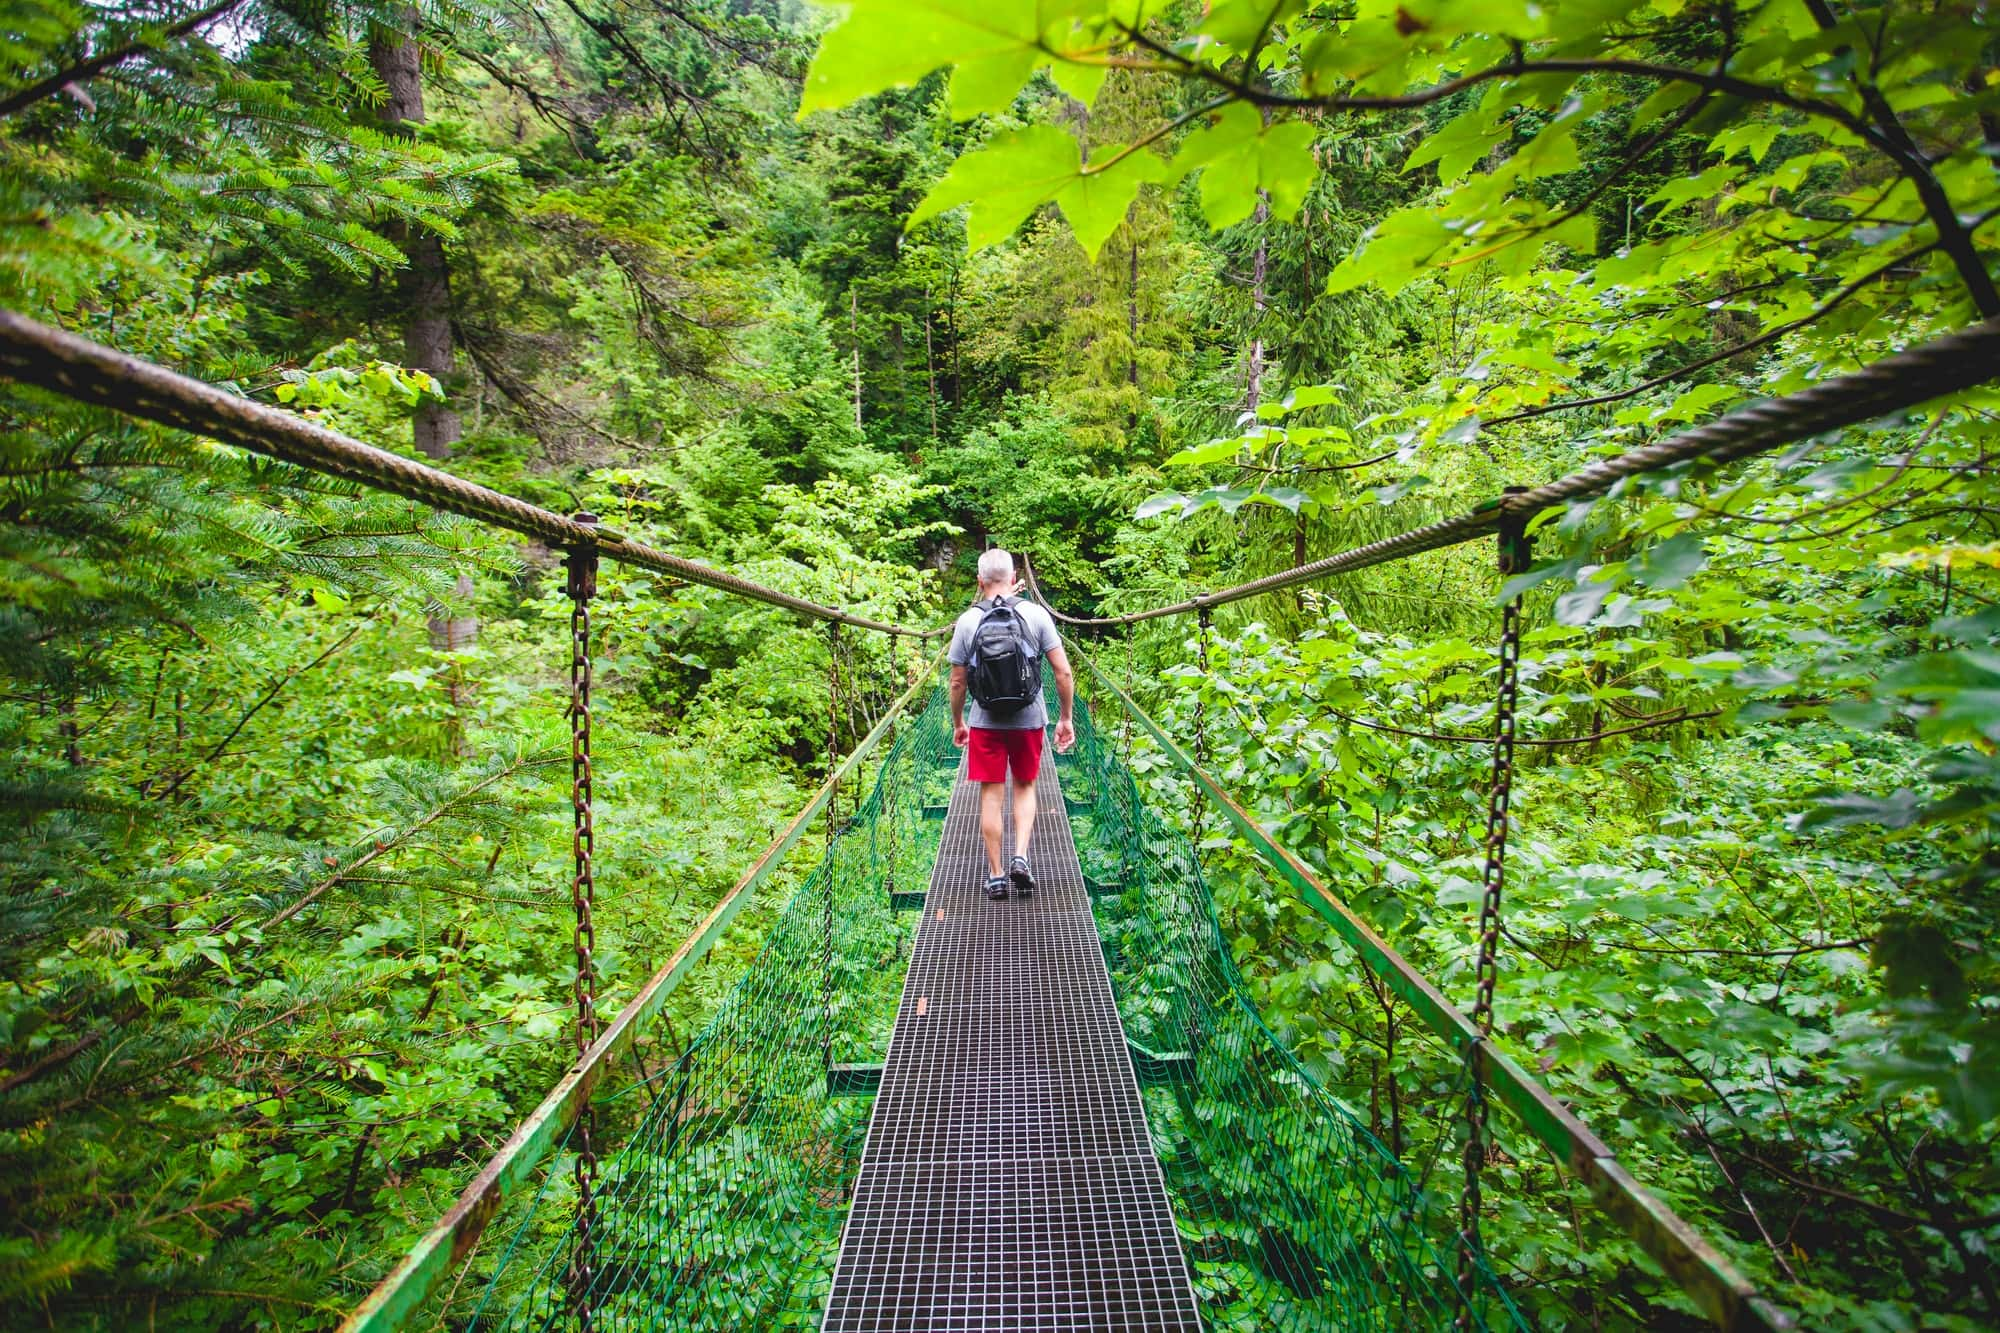 Hiker on the suspension bridge. The Tatras.